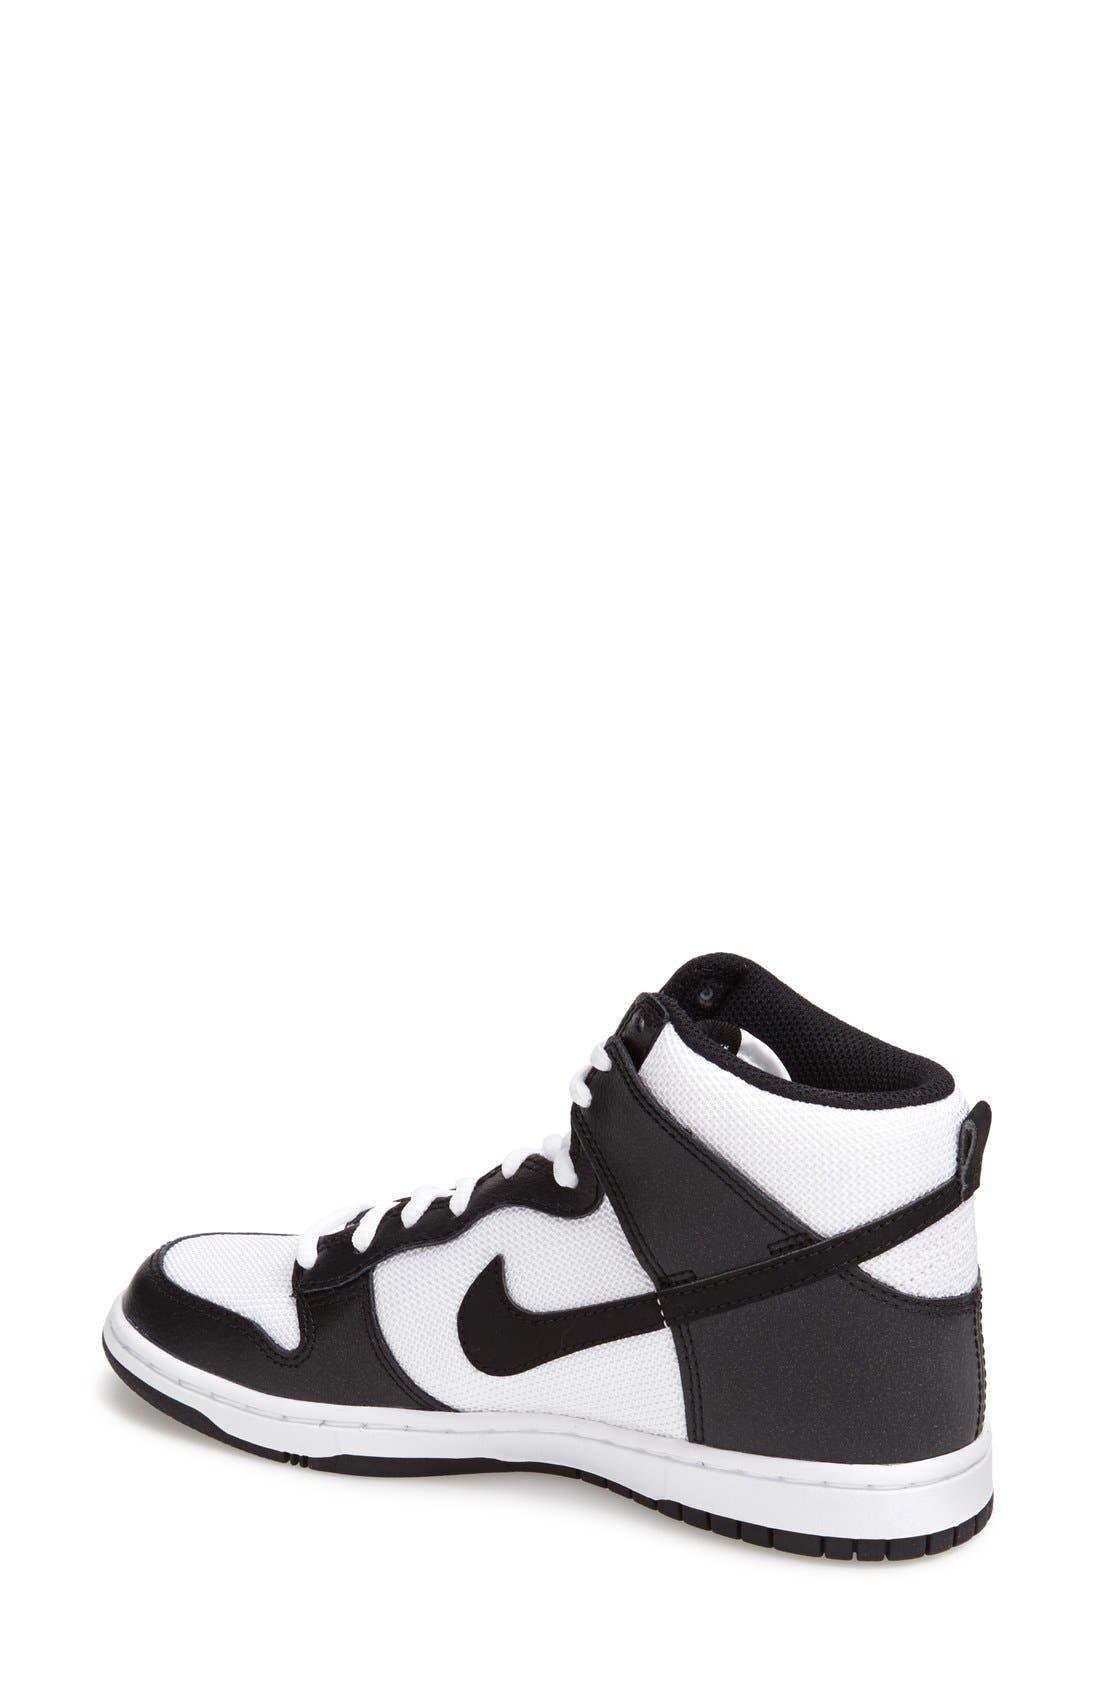 Alternate Image 2  - Nike 'Dunk High Skinny' Sneaker (Women)